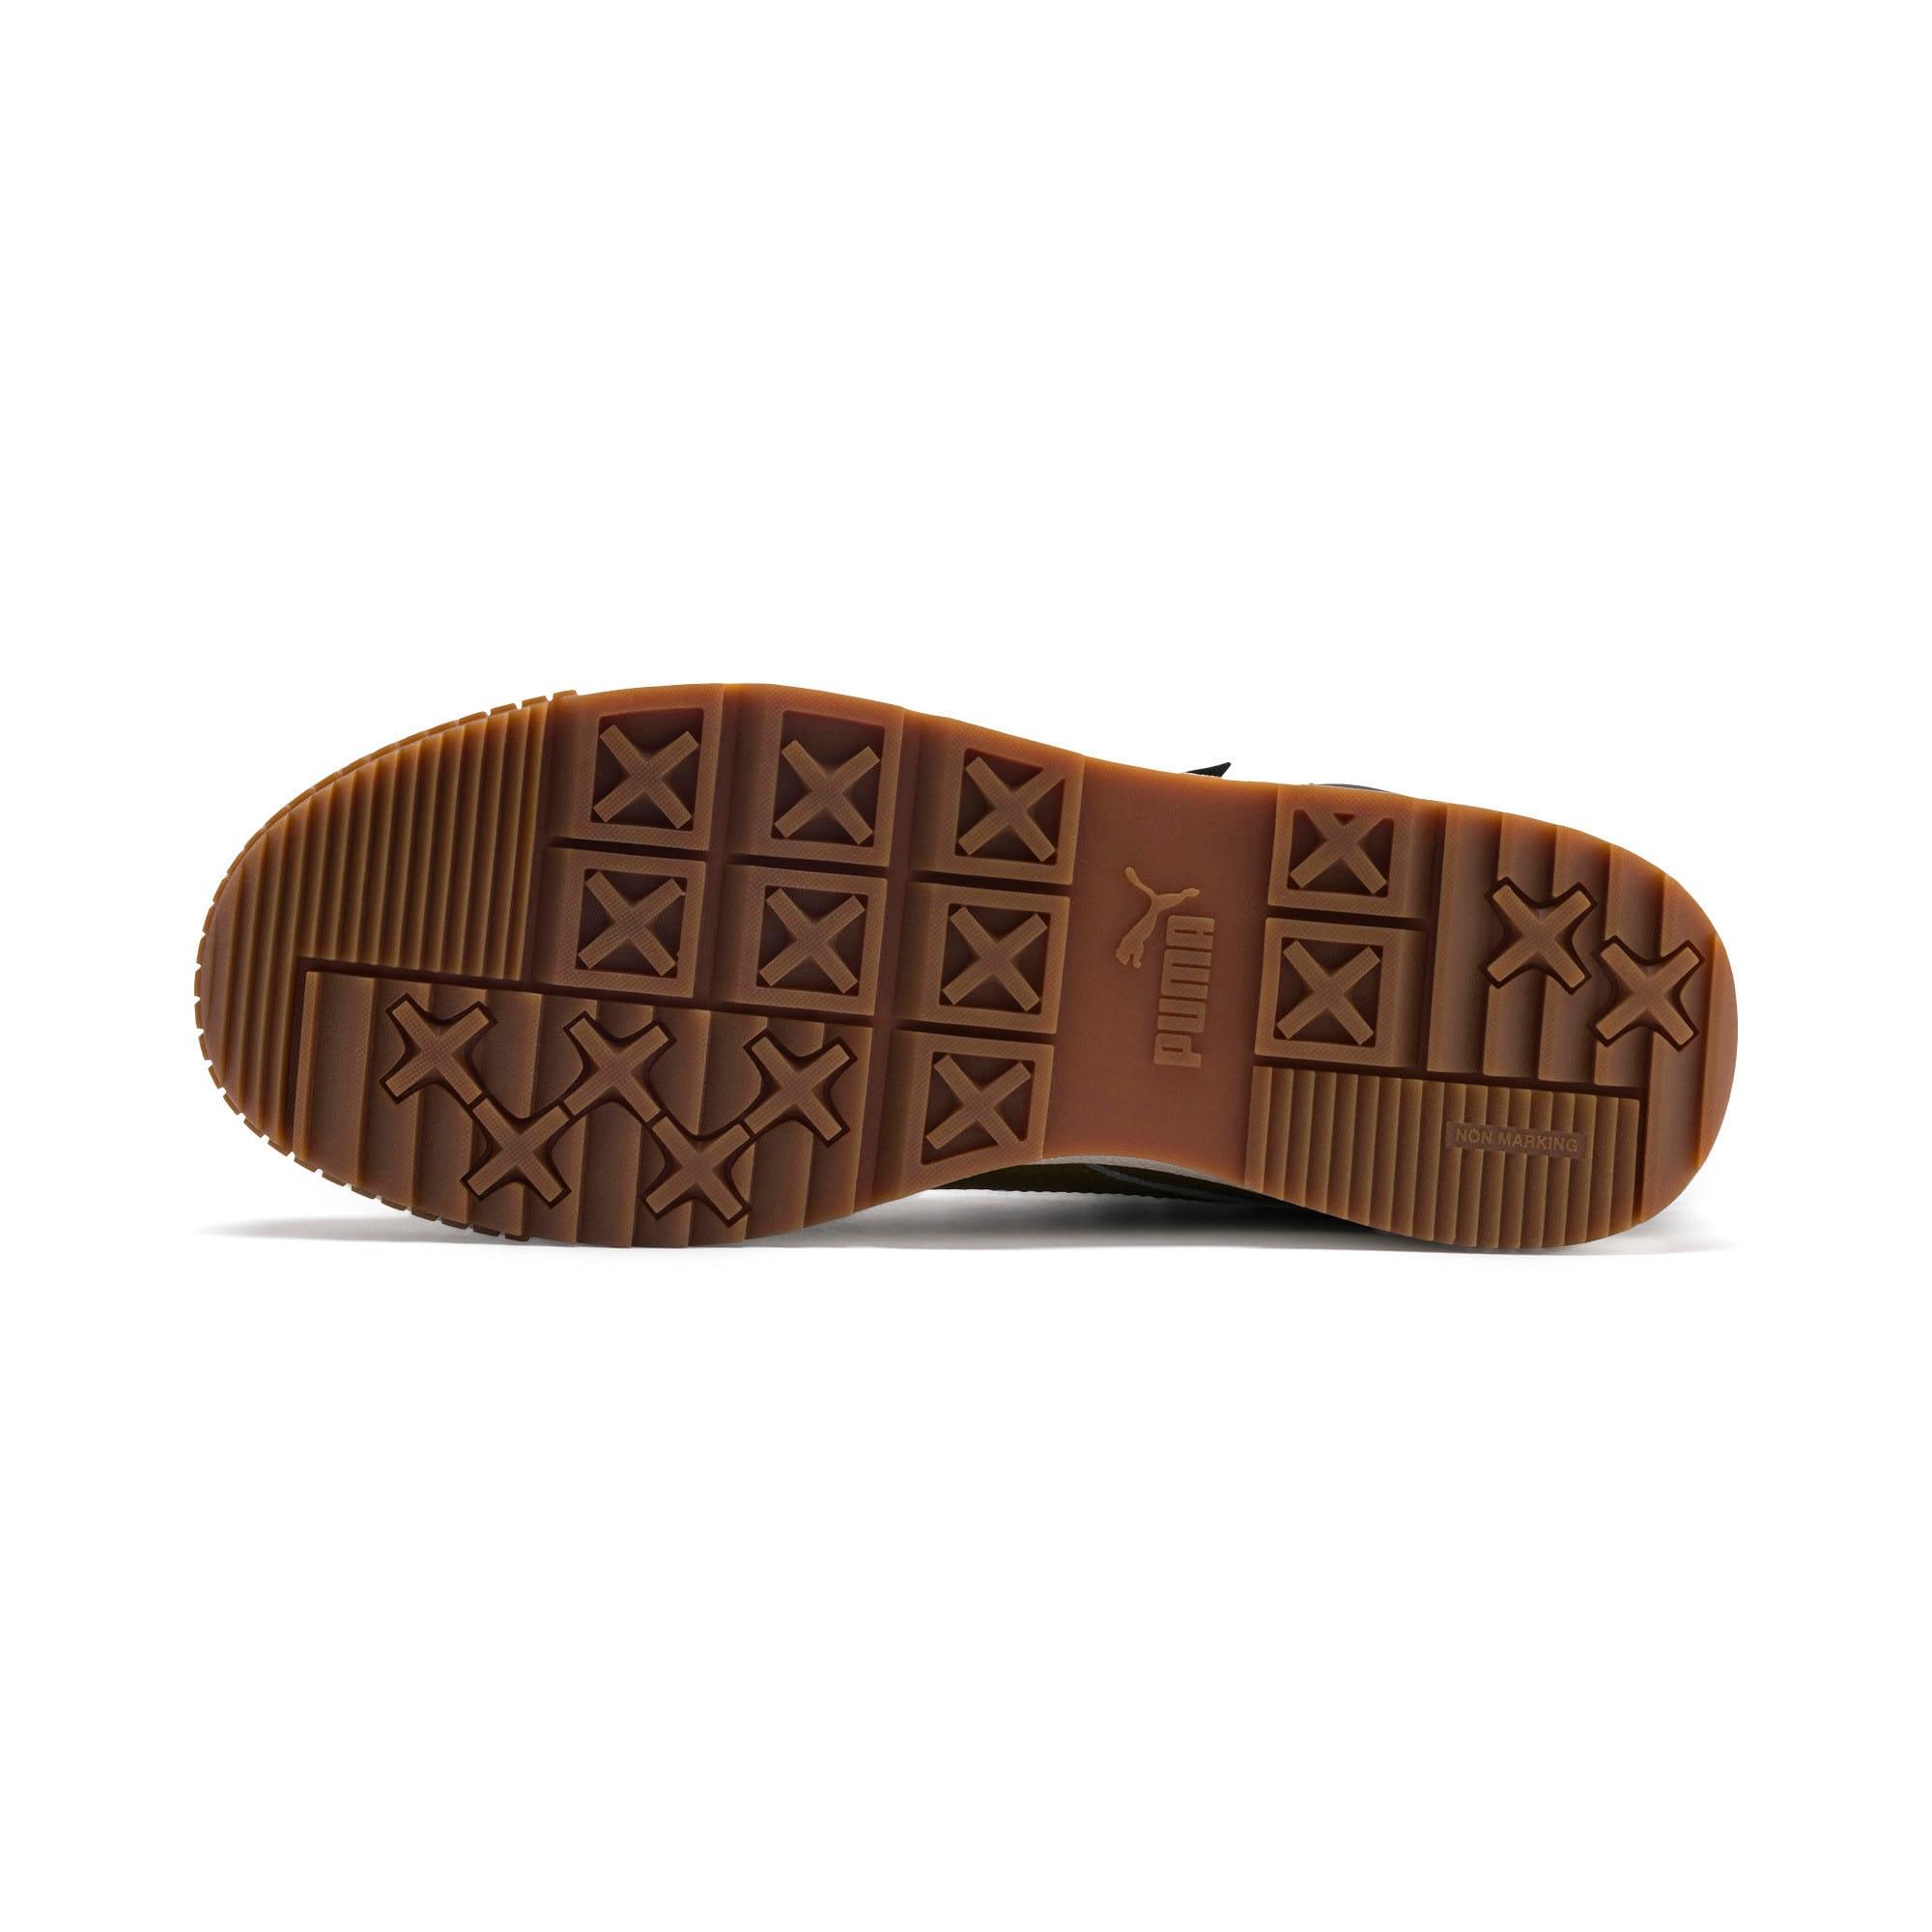 Thumbnail 5 of Tarrenz SB PURETEX Mid Sneakers, Moss Green-Puma Black, medium